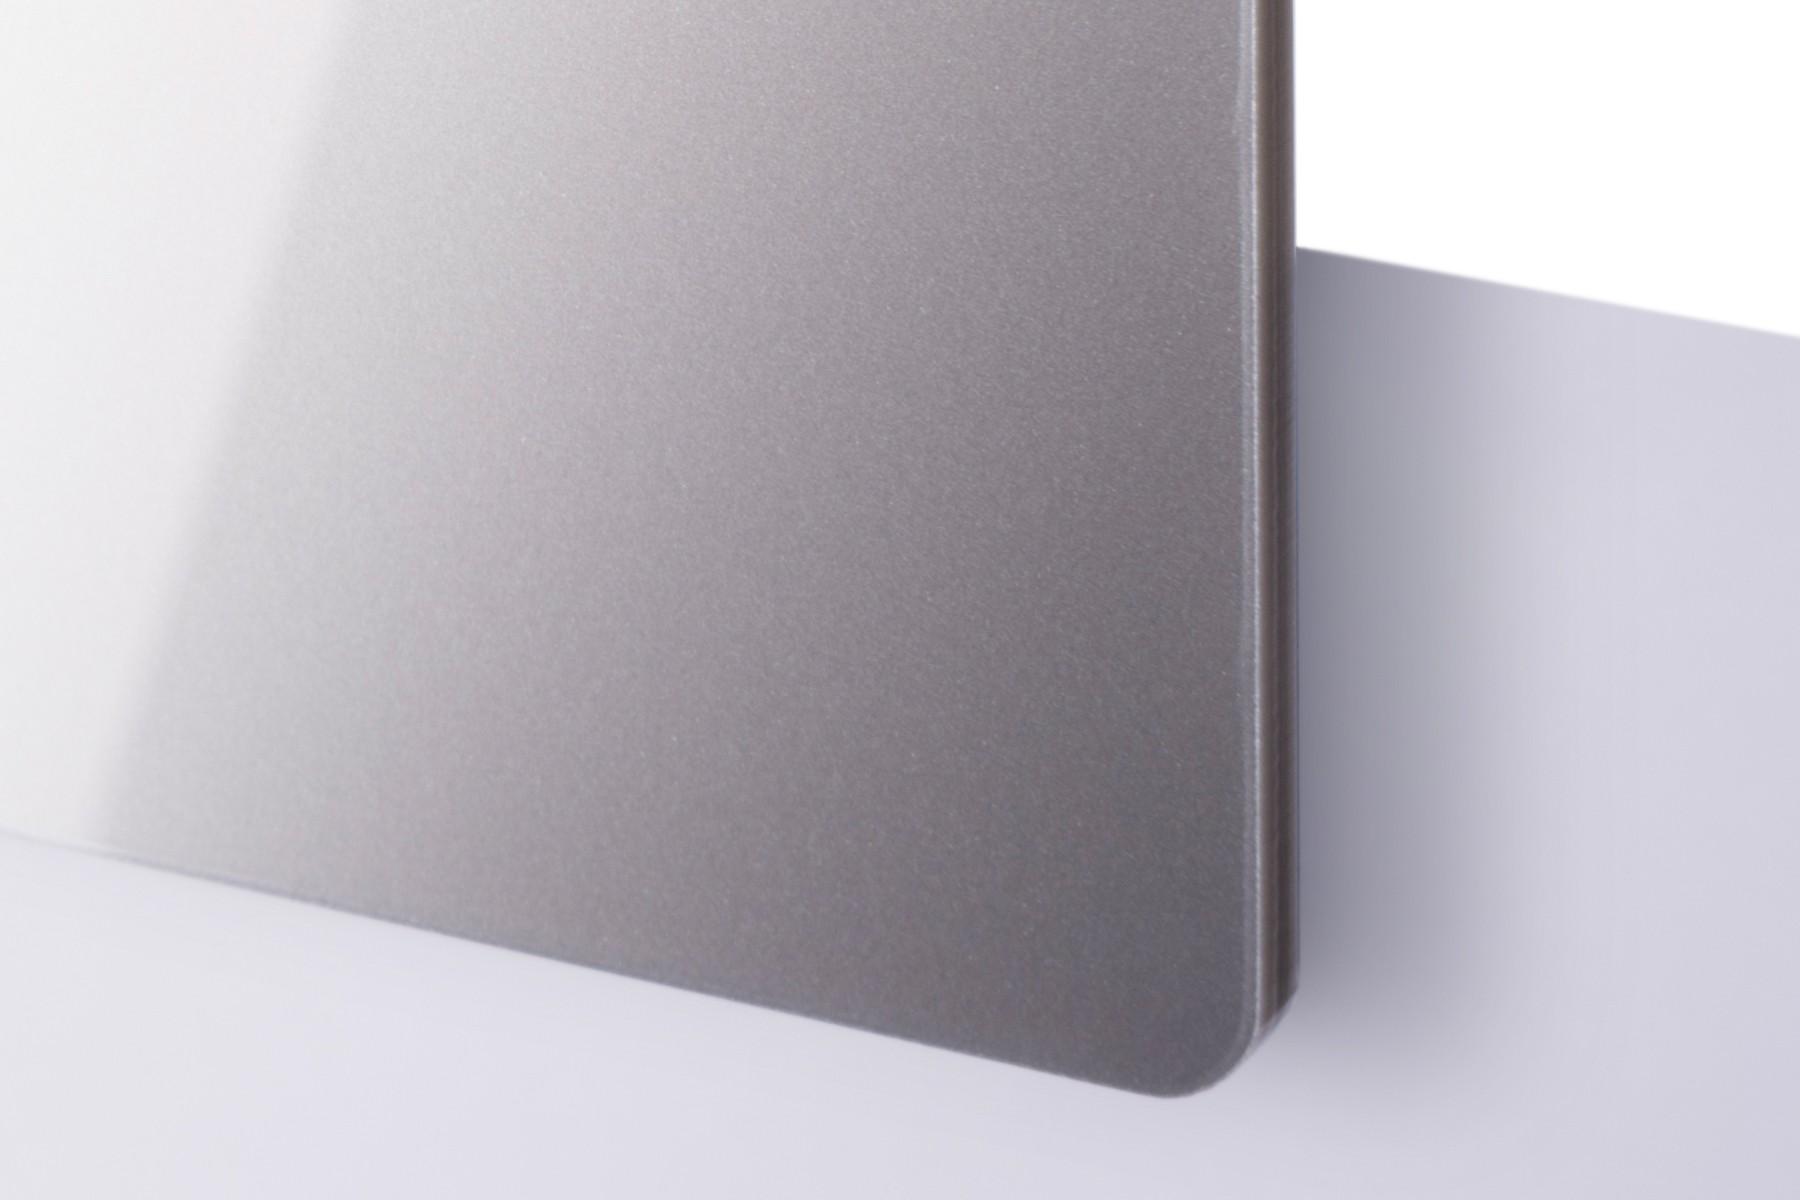 TroGlass Metallic Argent anthracite 3mm